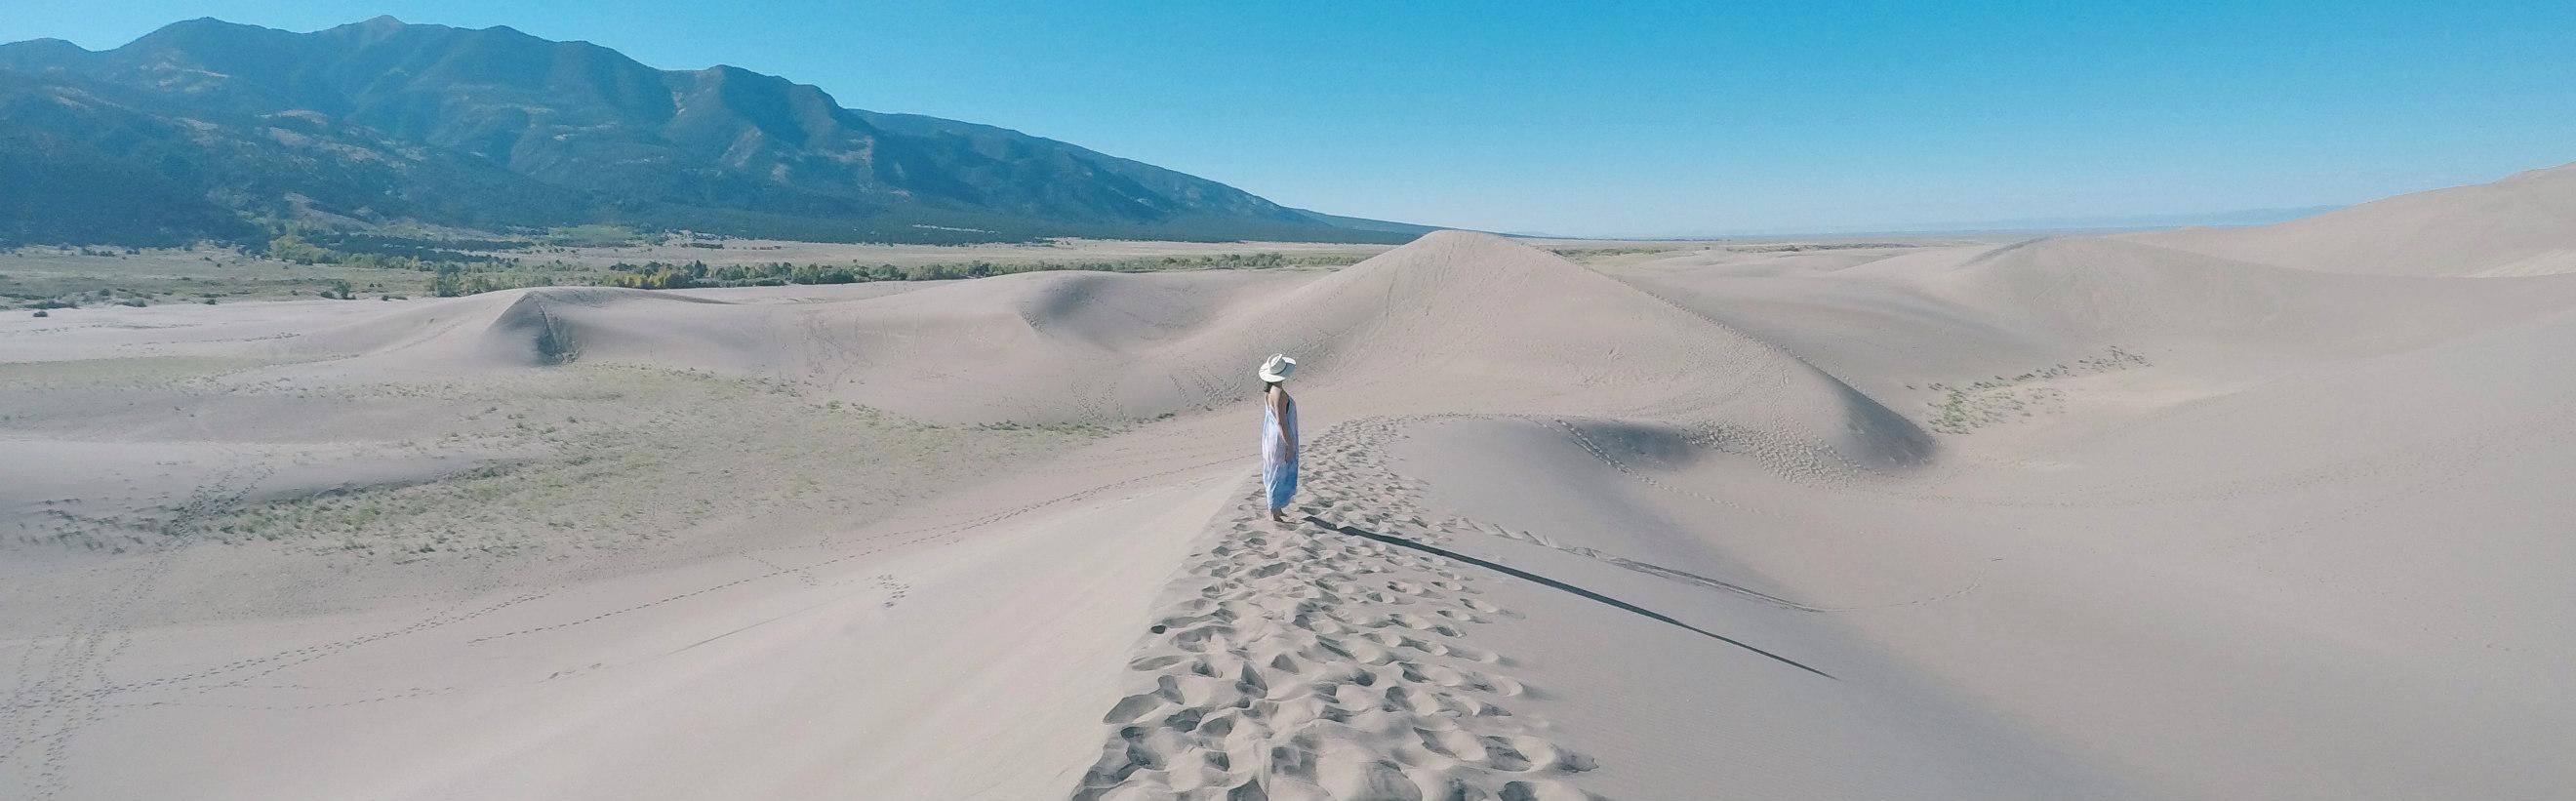 September in Great Sand Dunes National Park